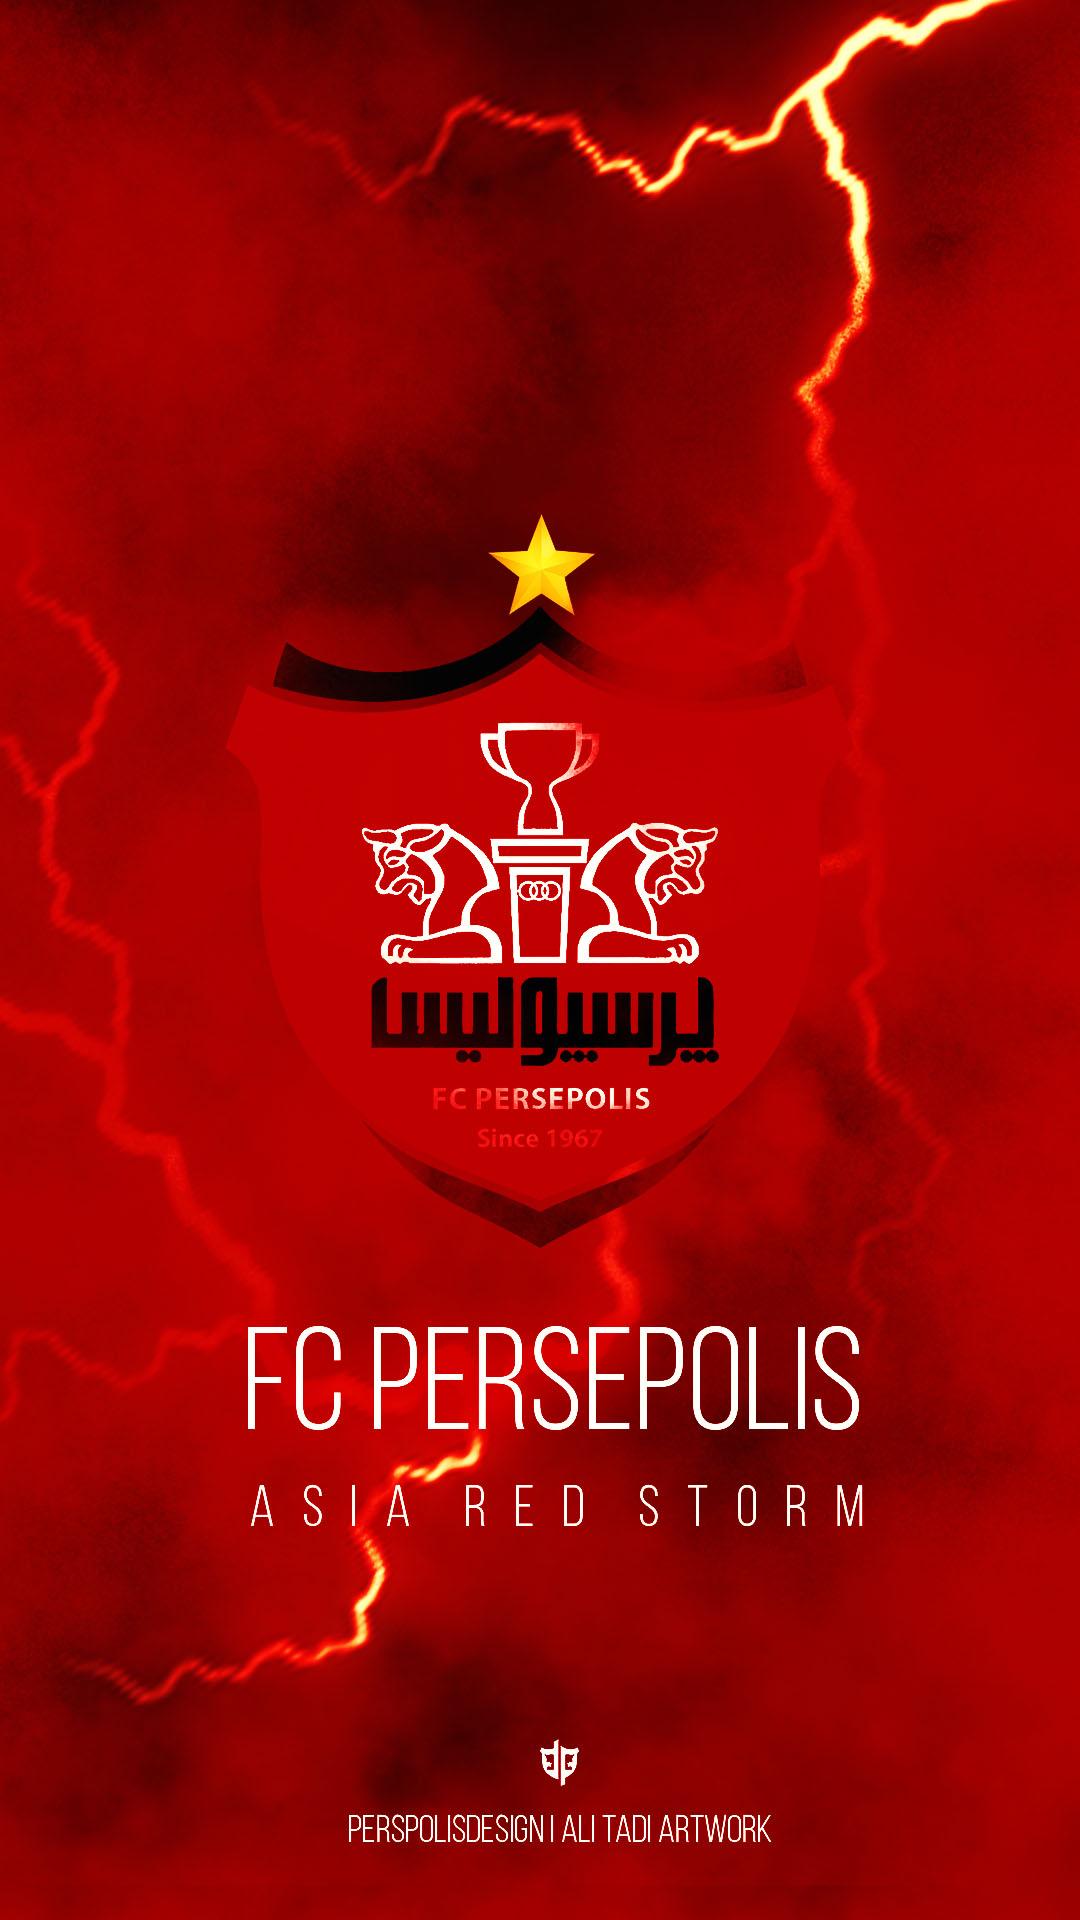 Sports Persepolis F Persepolis Fc 1724023 Hd Wallpaper Backgrounds Download